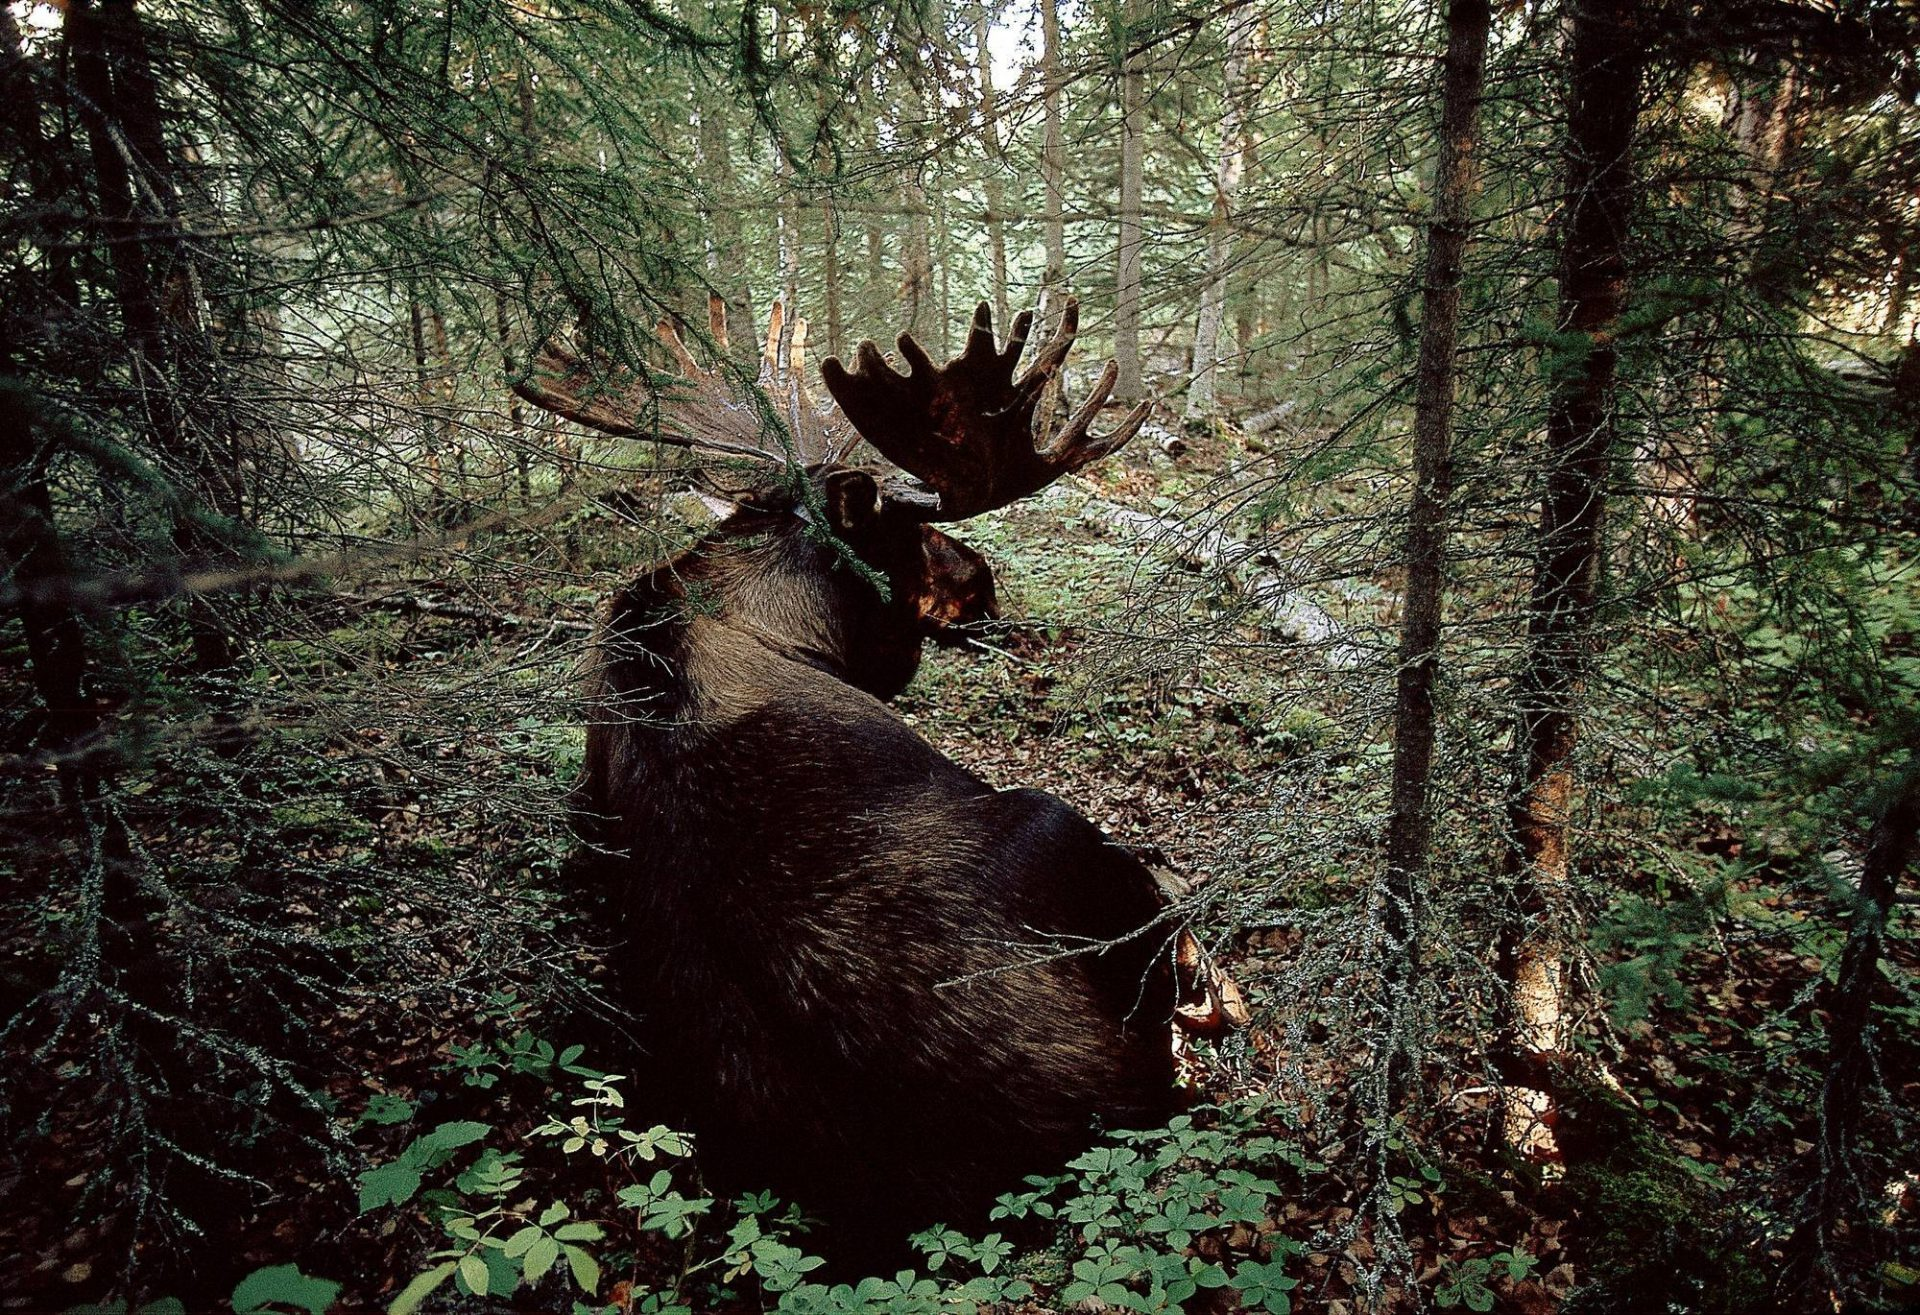 Photo: A hand-raised moose in Alaska's Kenai National Wildlife Refuge.